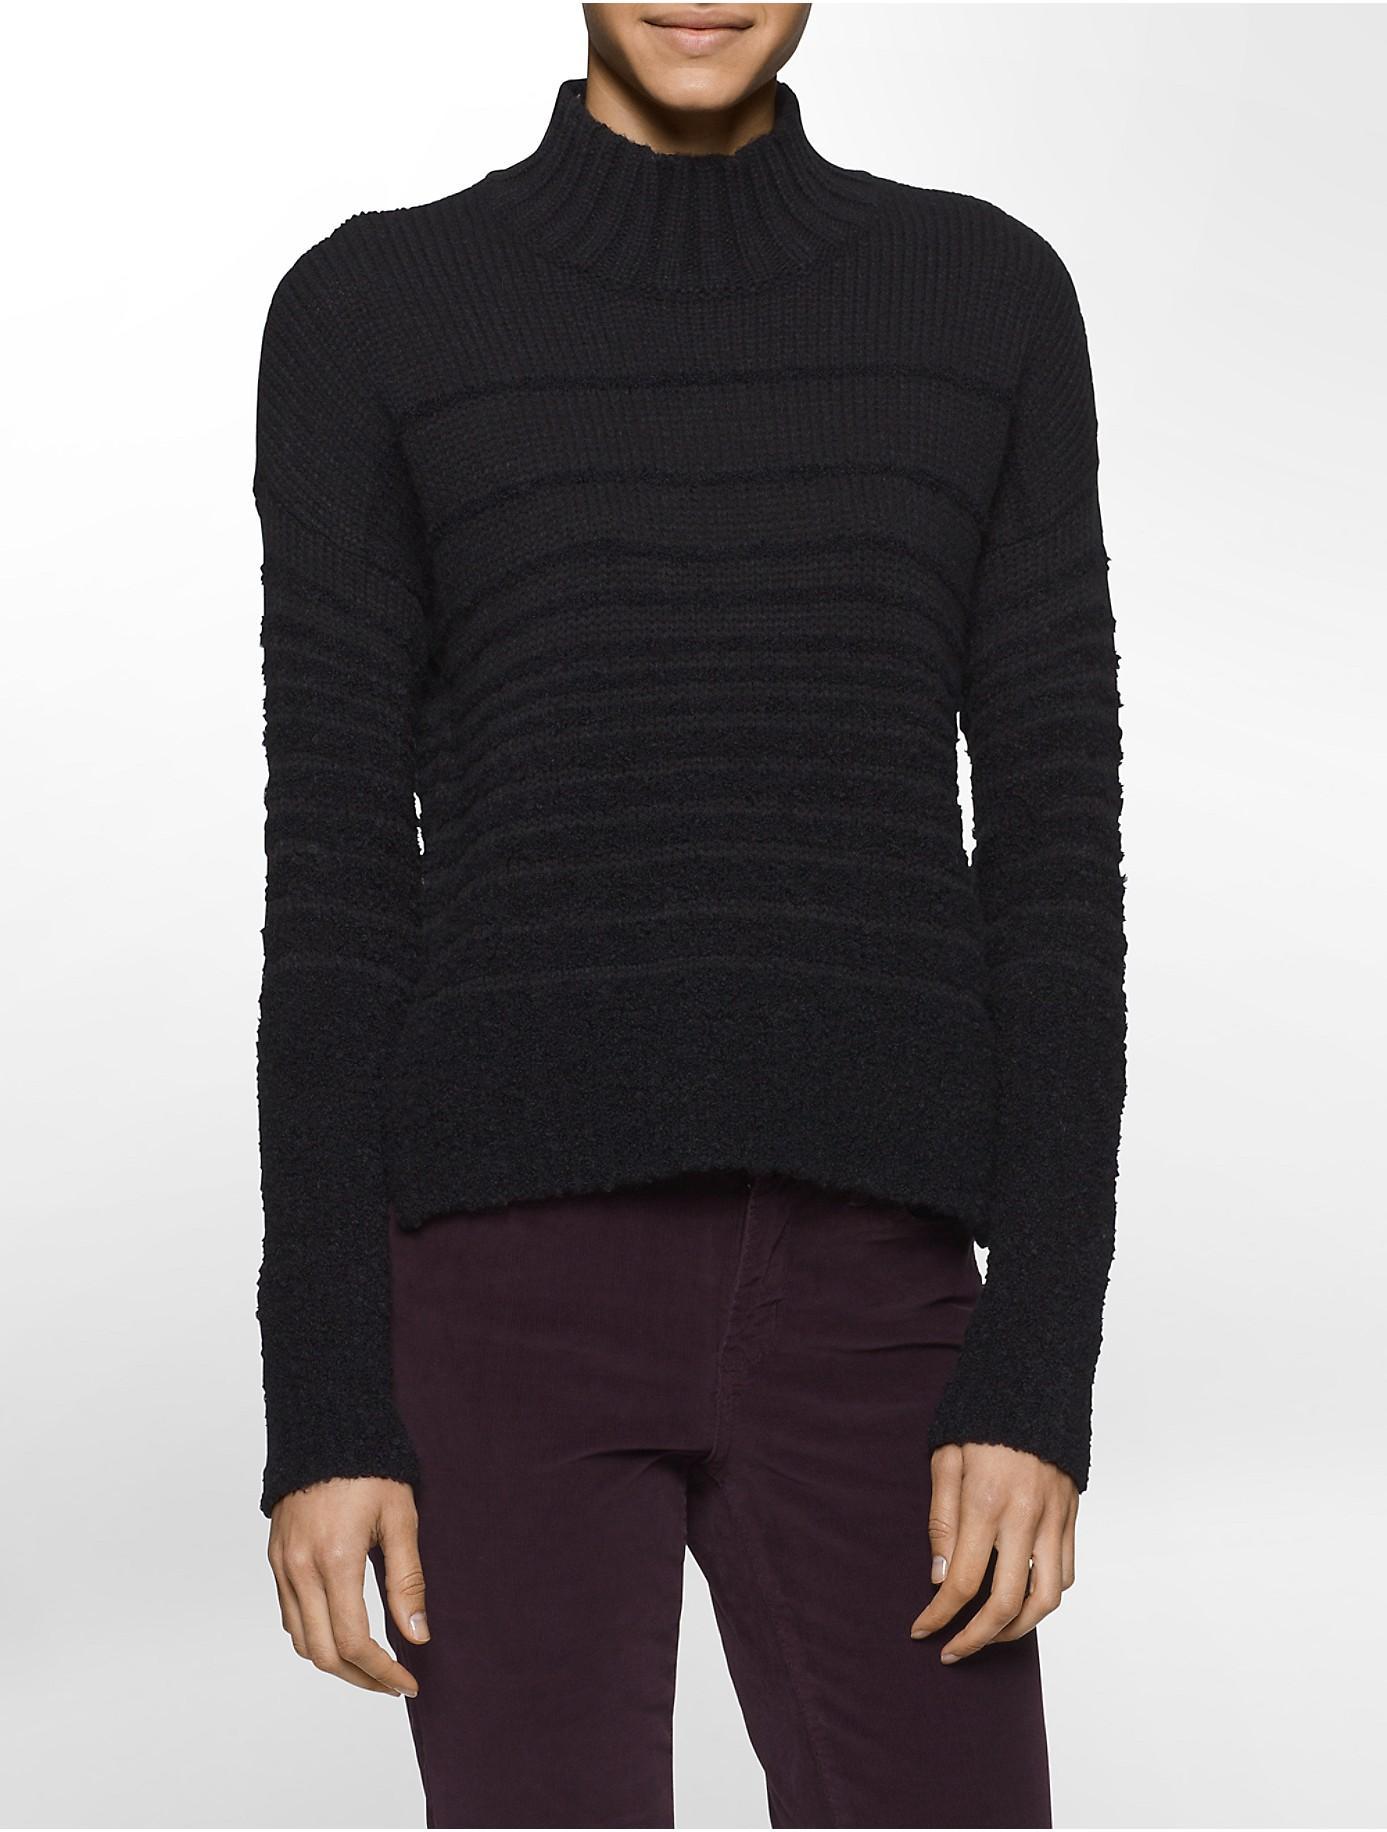 calvin klein jeans boucle mock neck sweater in black for. Black Bedroom Furniture Sets. Home Design Ideas